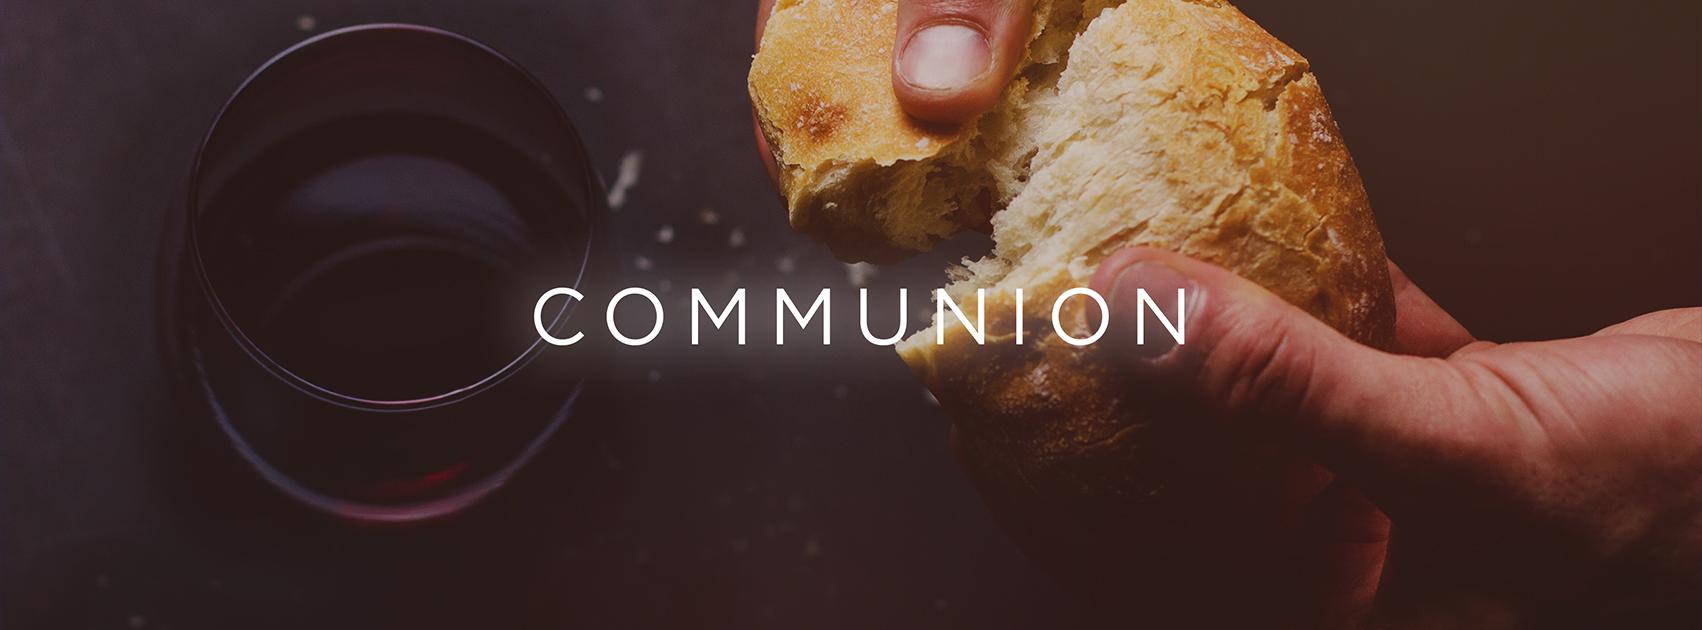 Communion FB Cover Photo.jpg